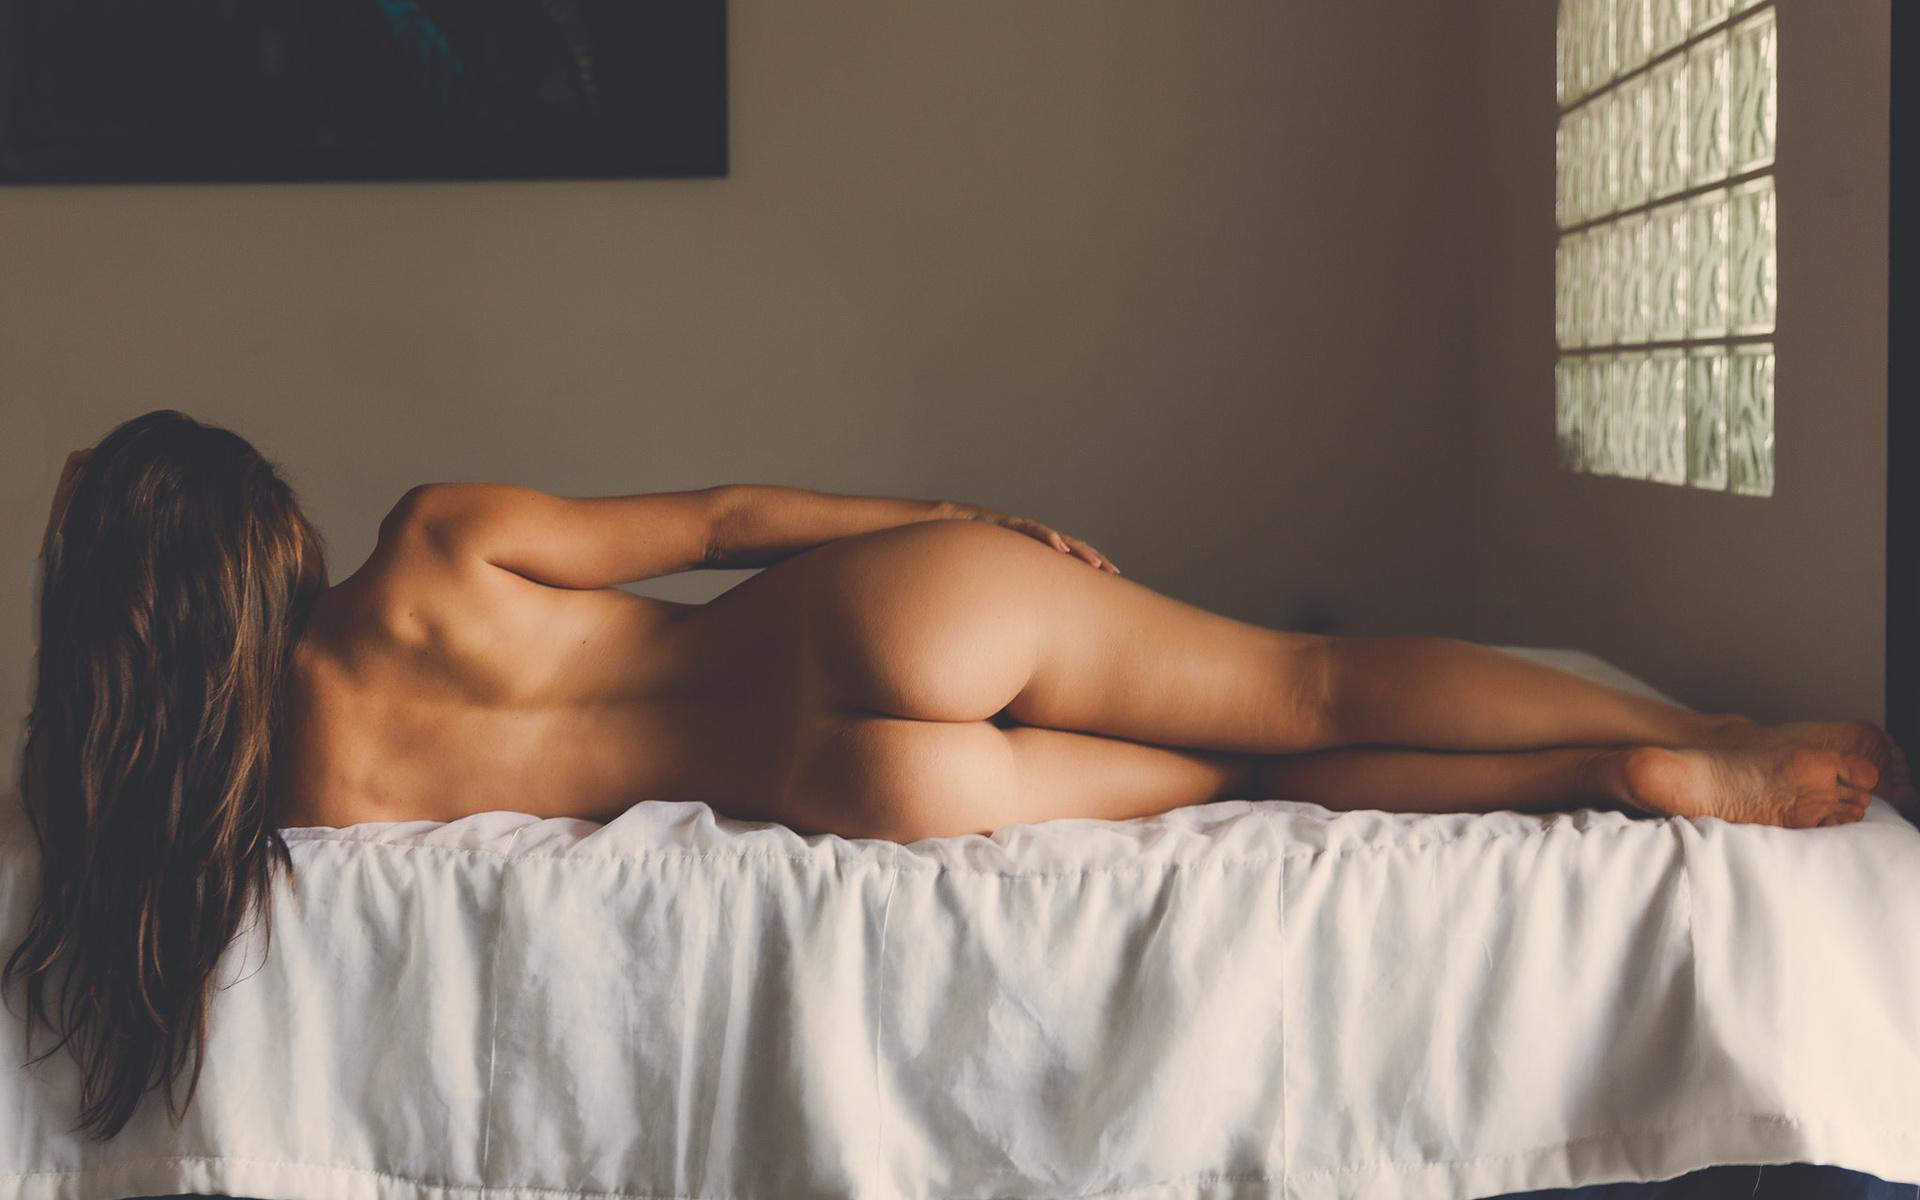 Art Model Poses